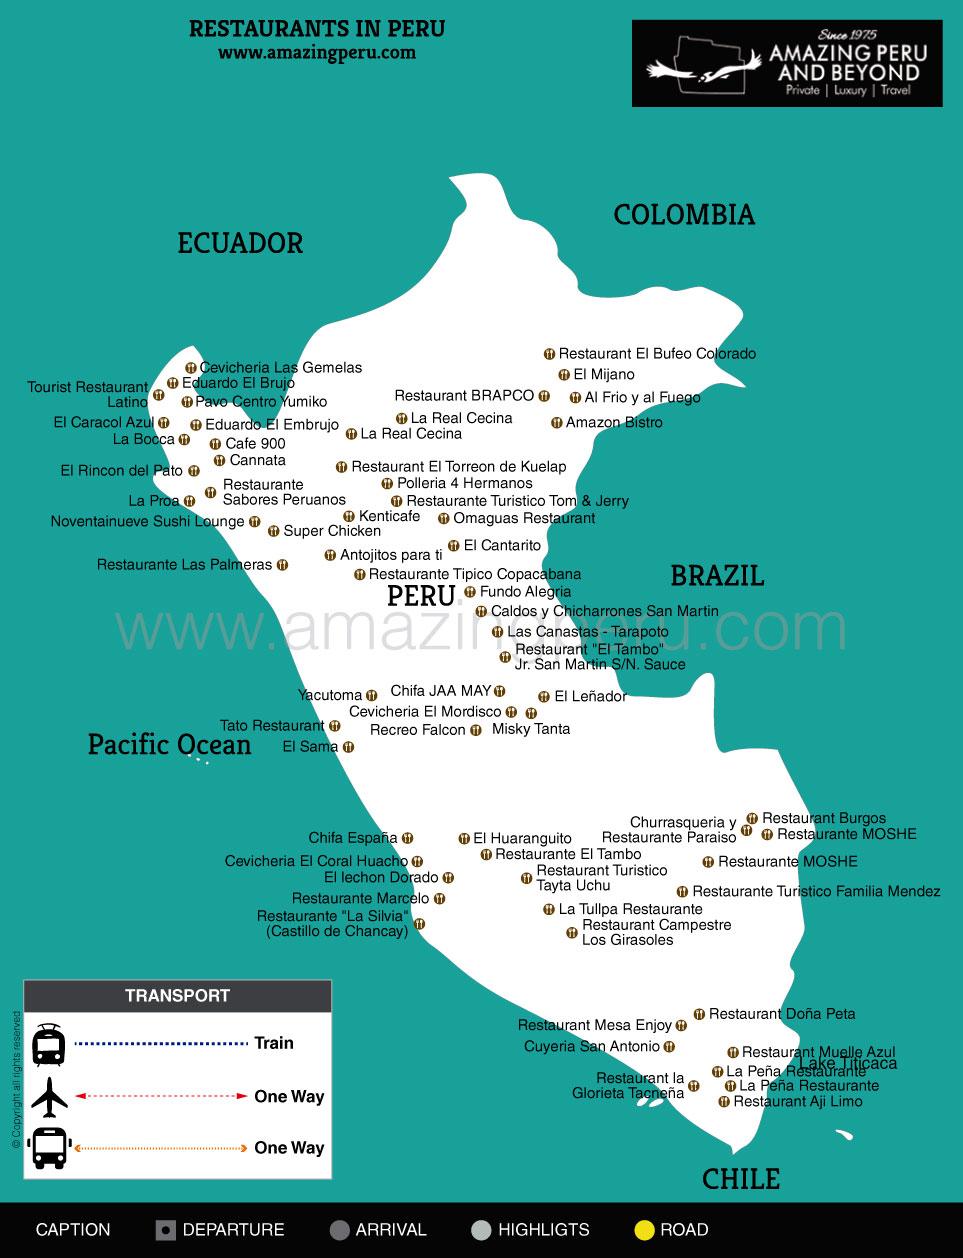 Peru Gourmet Tour - Gourmet tour in peru